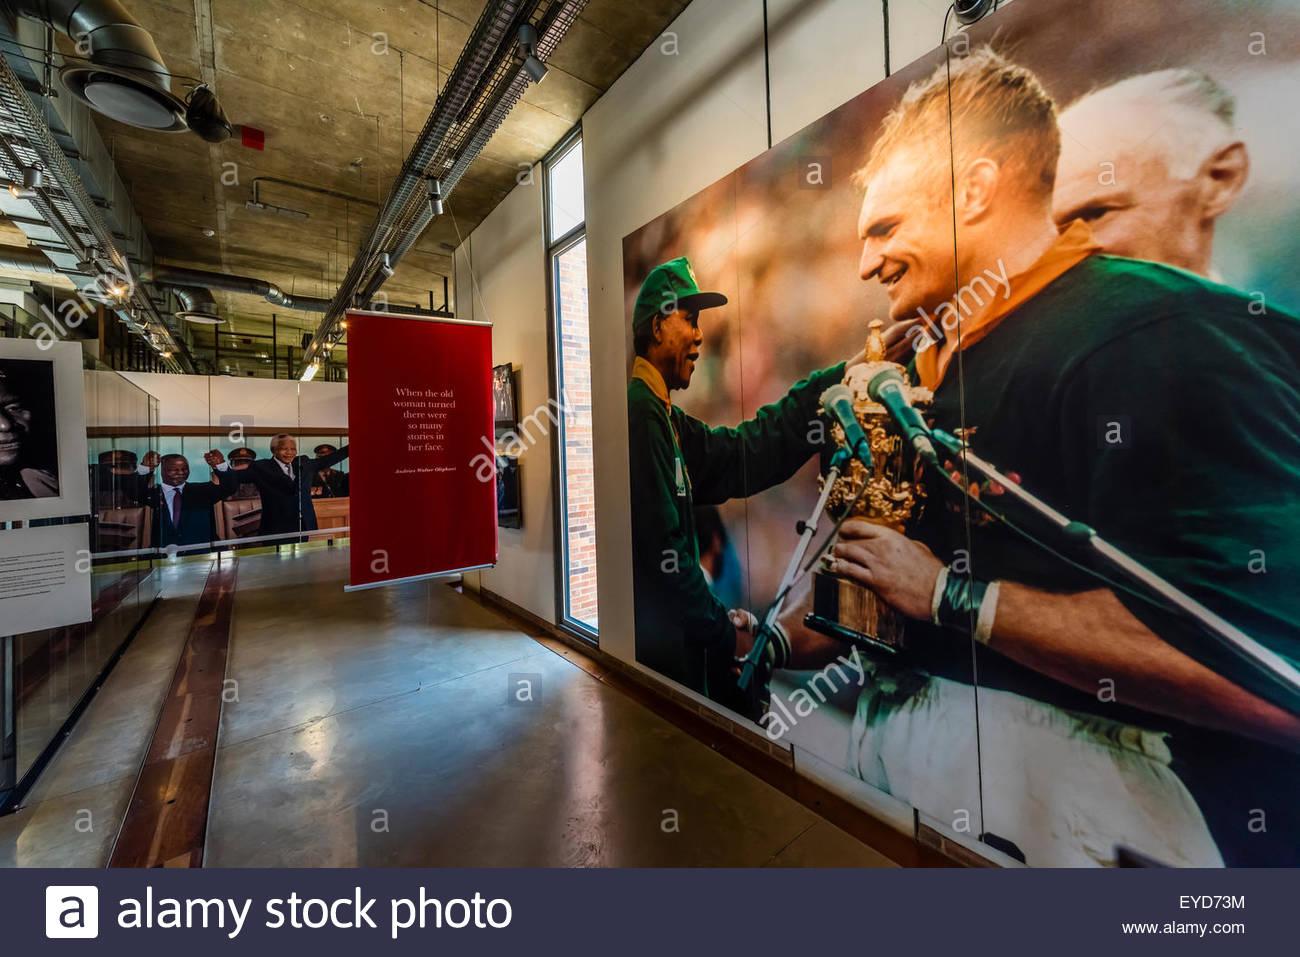 Apartheid Museum, Johannesburg, South Africa. - Stock Image